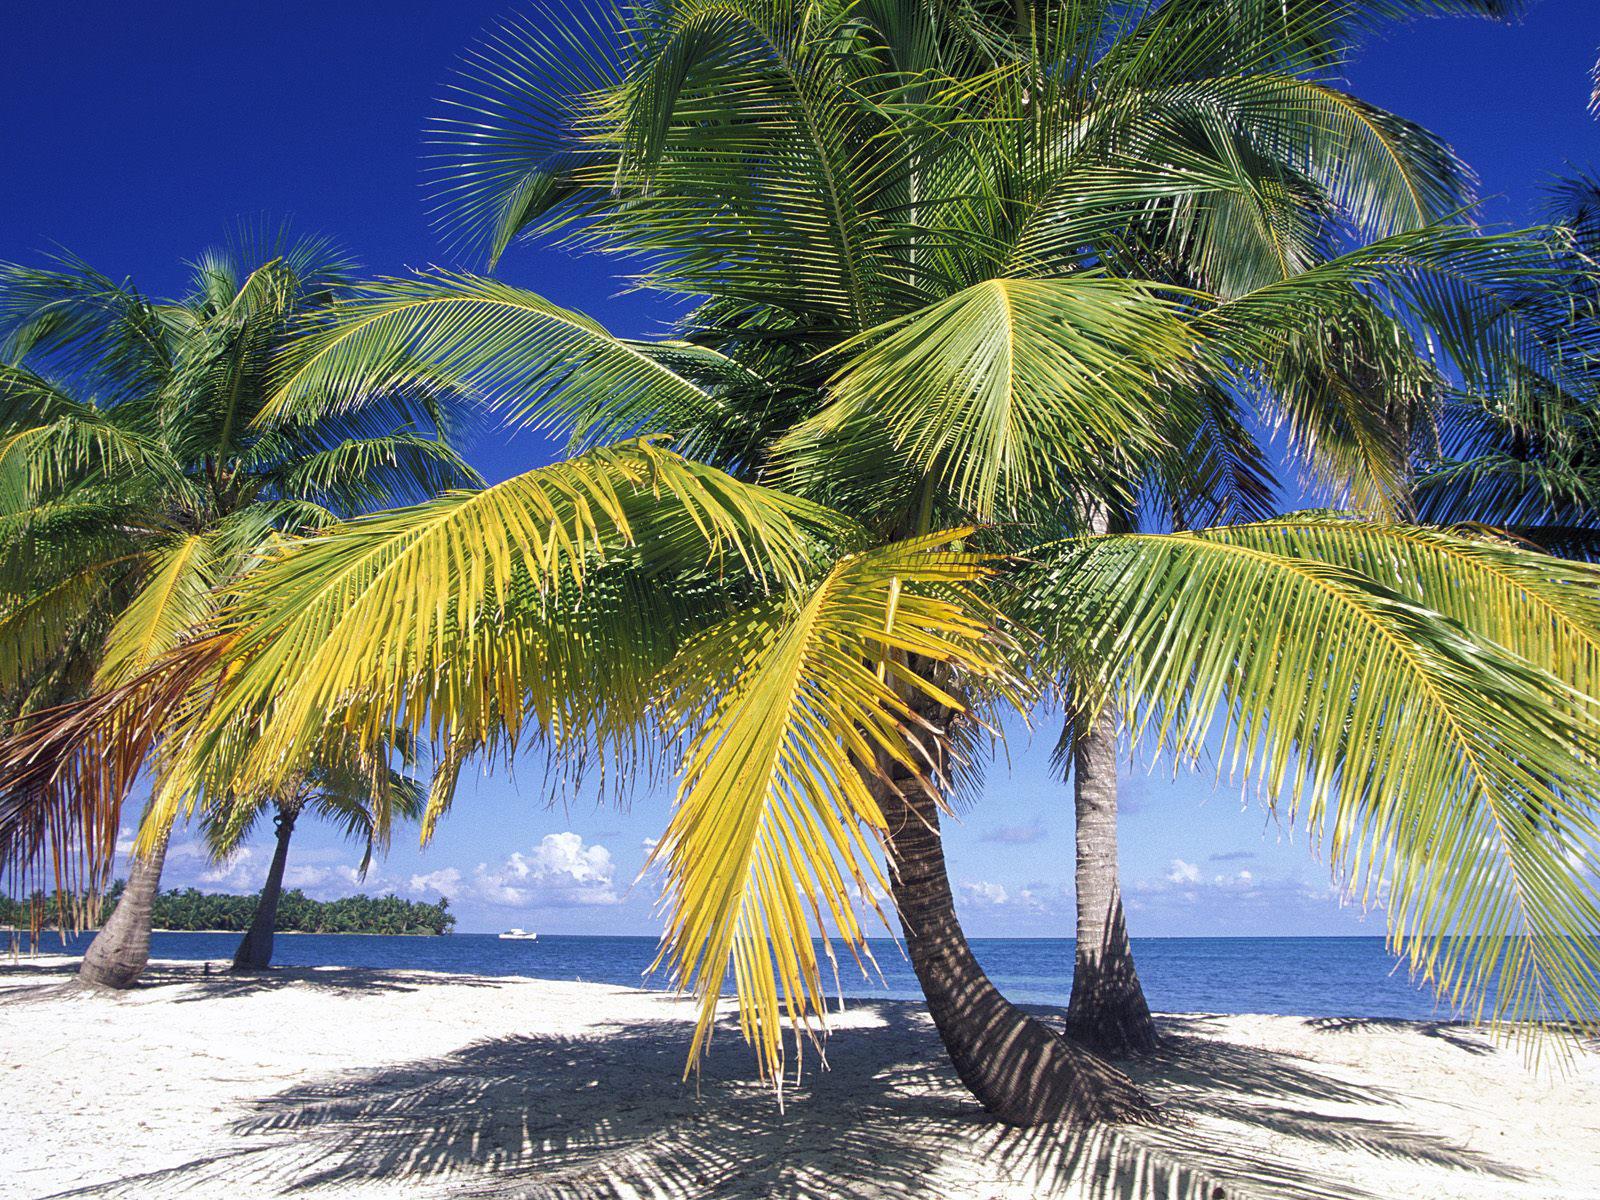 30 Image For Mobile Belize